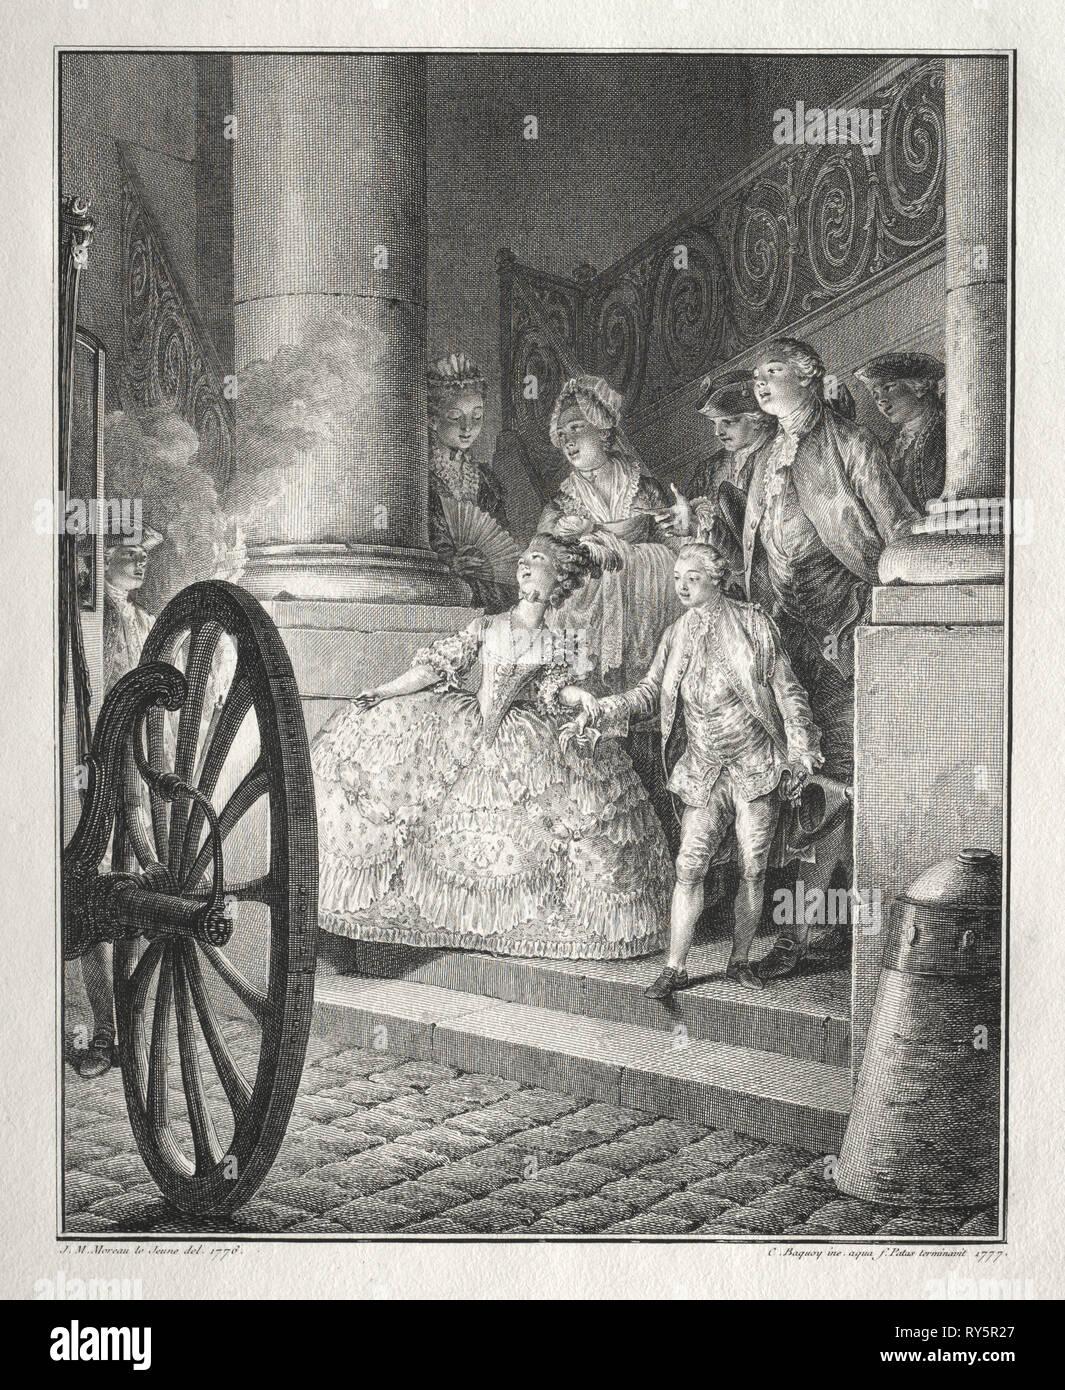 Rêtif de la Bretonne:  The Little Godparents, 1777. Jean-Michel the Younger Moreau (French, 1741-1814). Etching and engraving - Stock Image